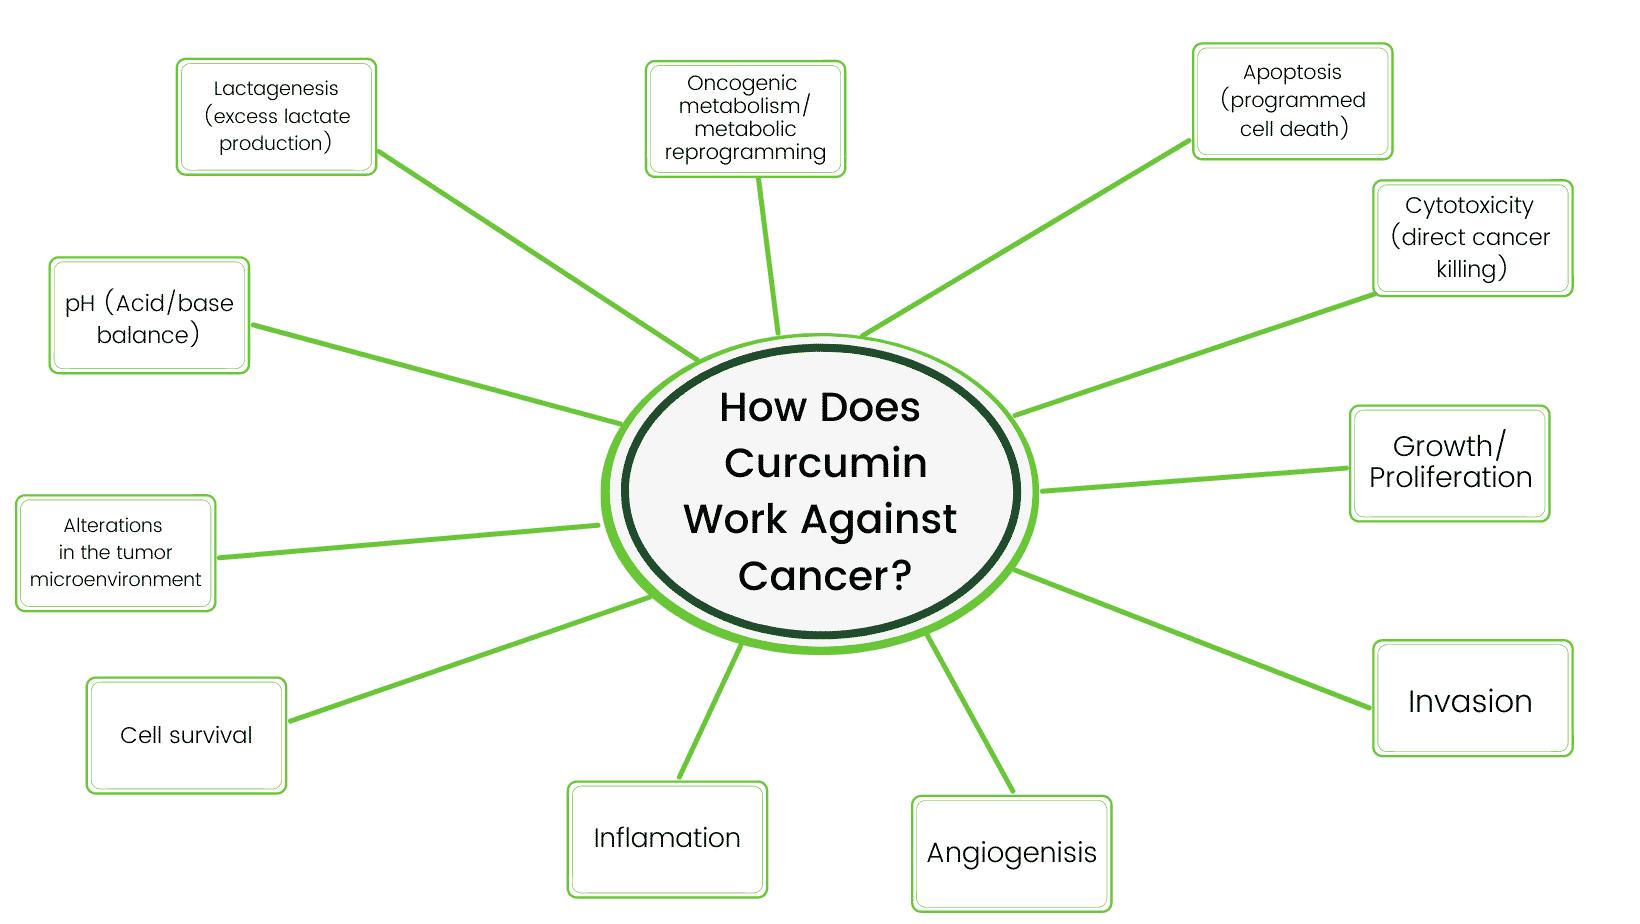 curcumin and cancer